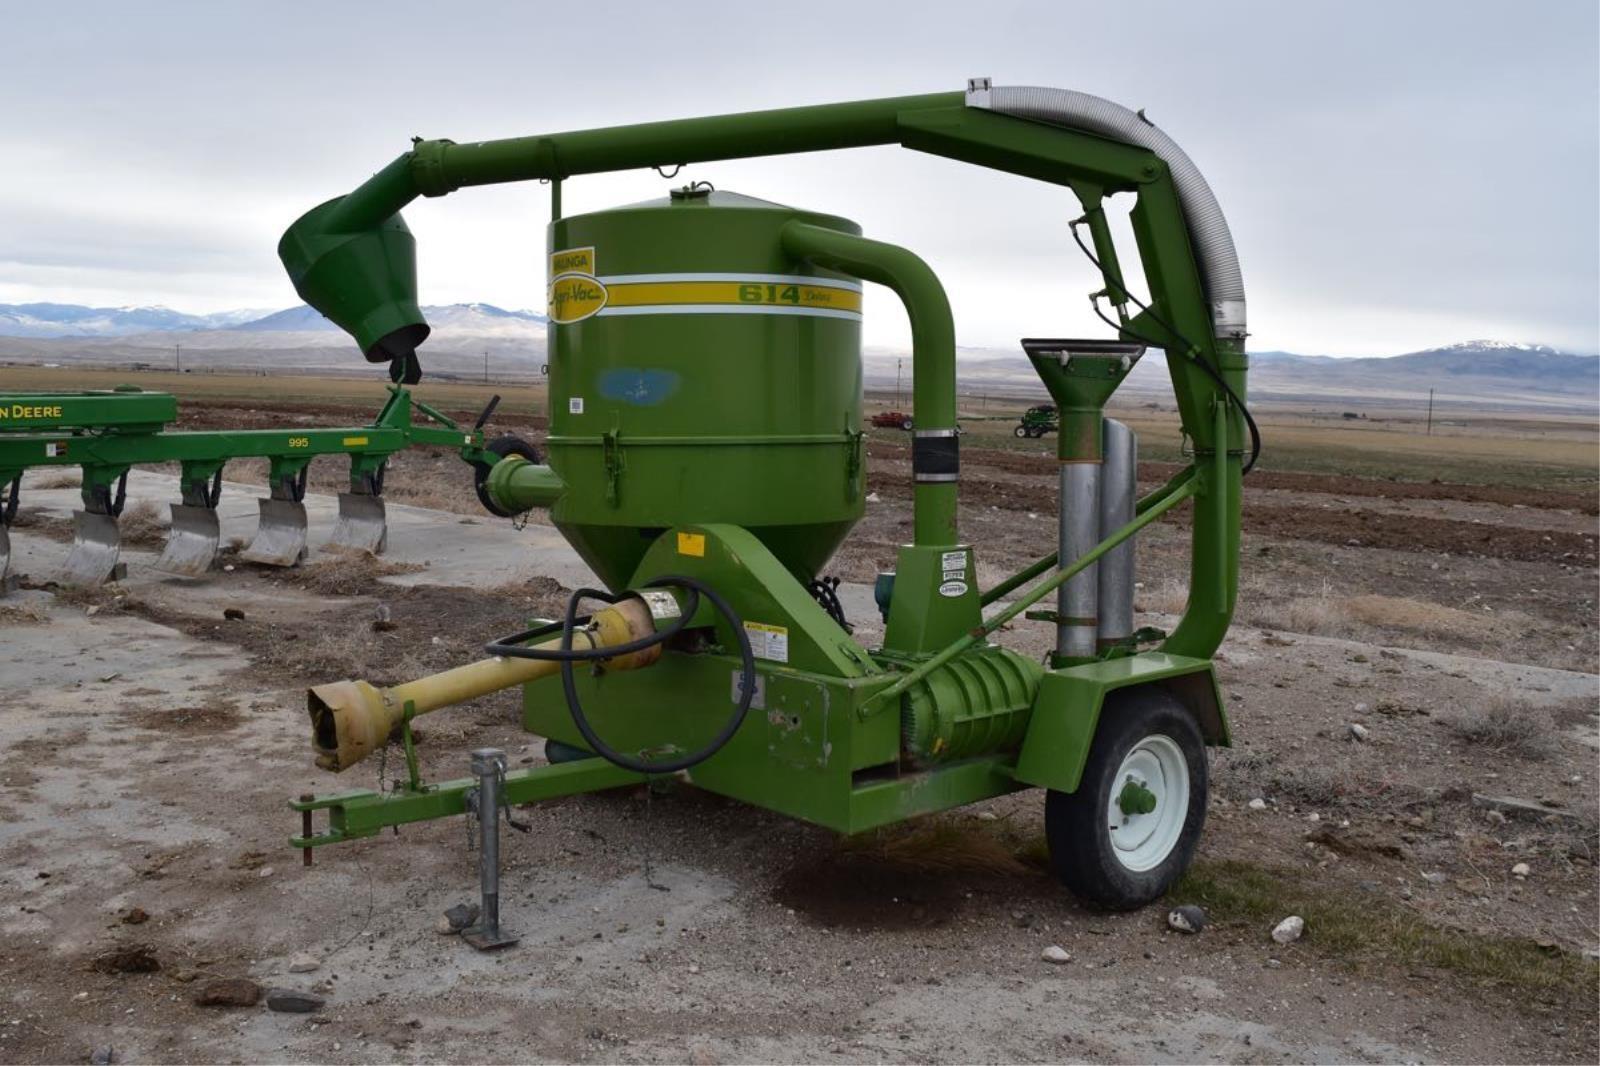 Walinga Agri-Vac 614 Deluxe